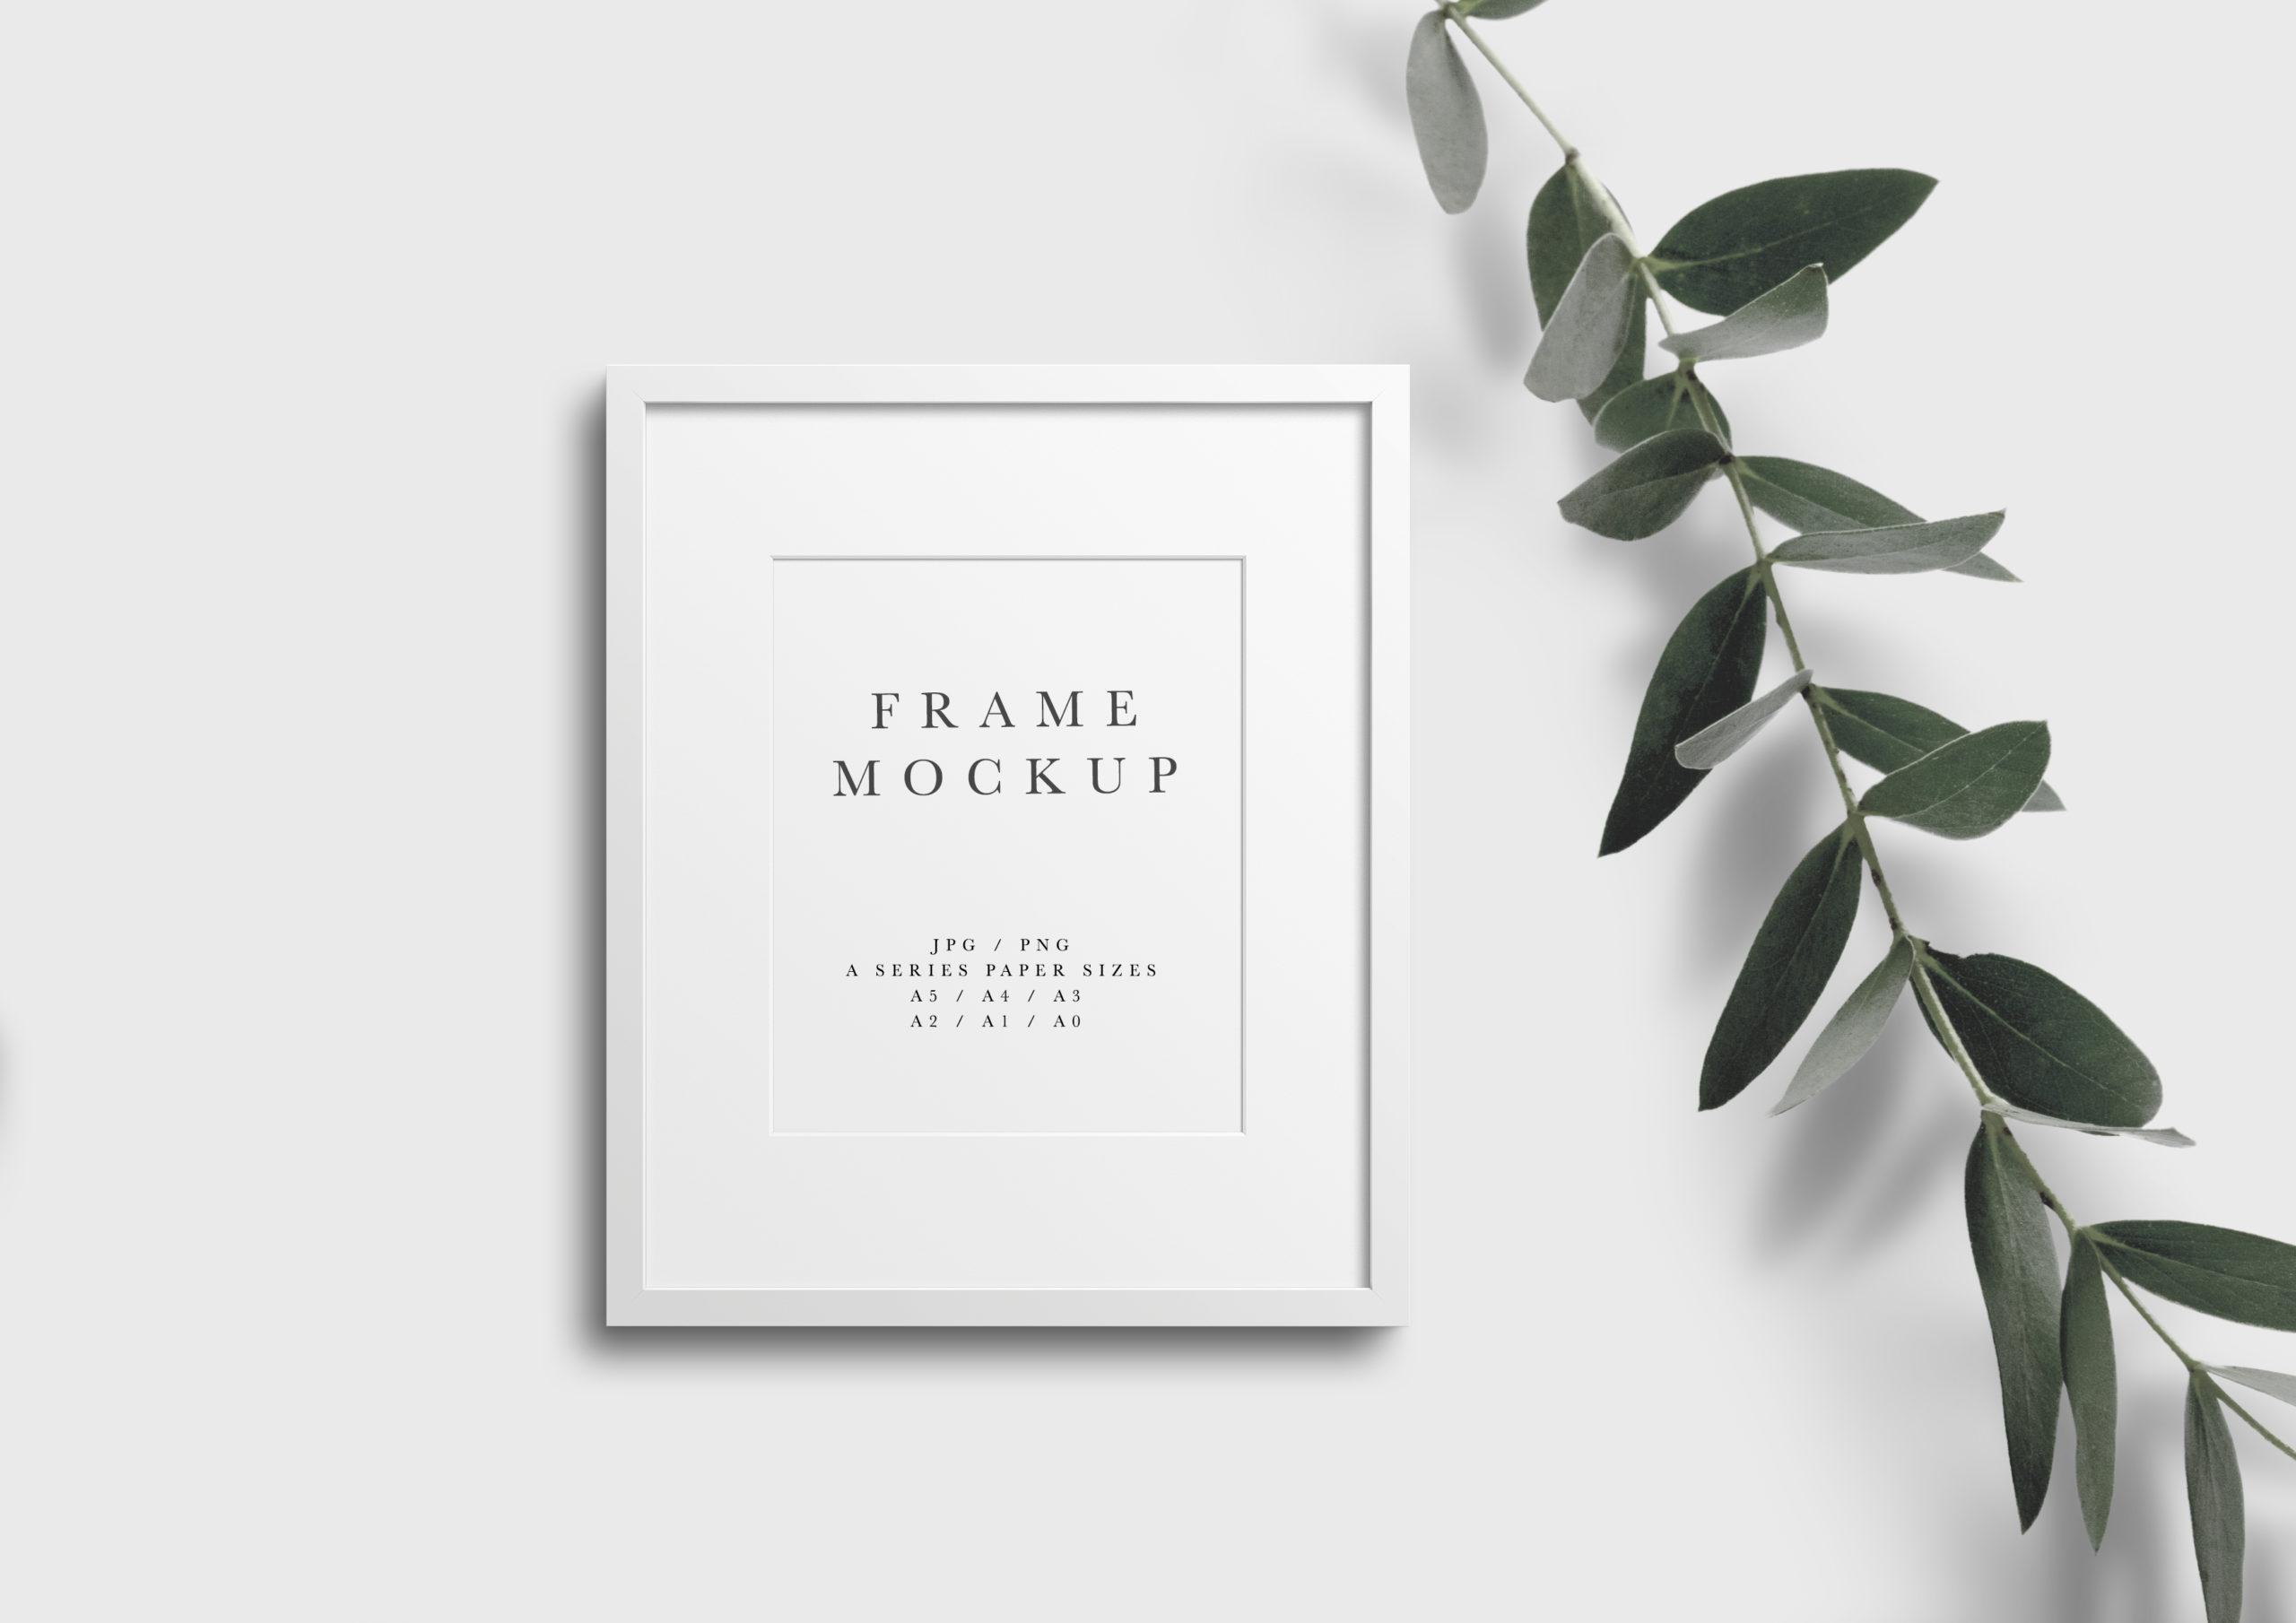 styled white frame photo mockup with minimal leaves